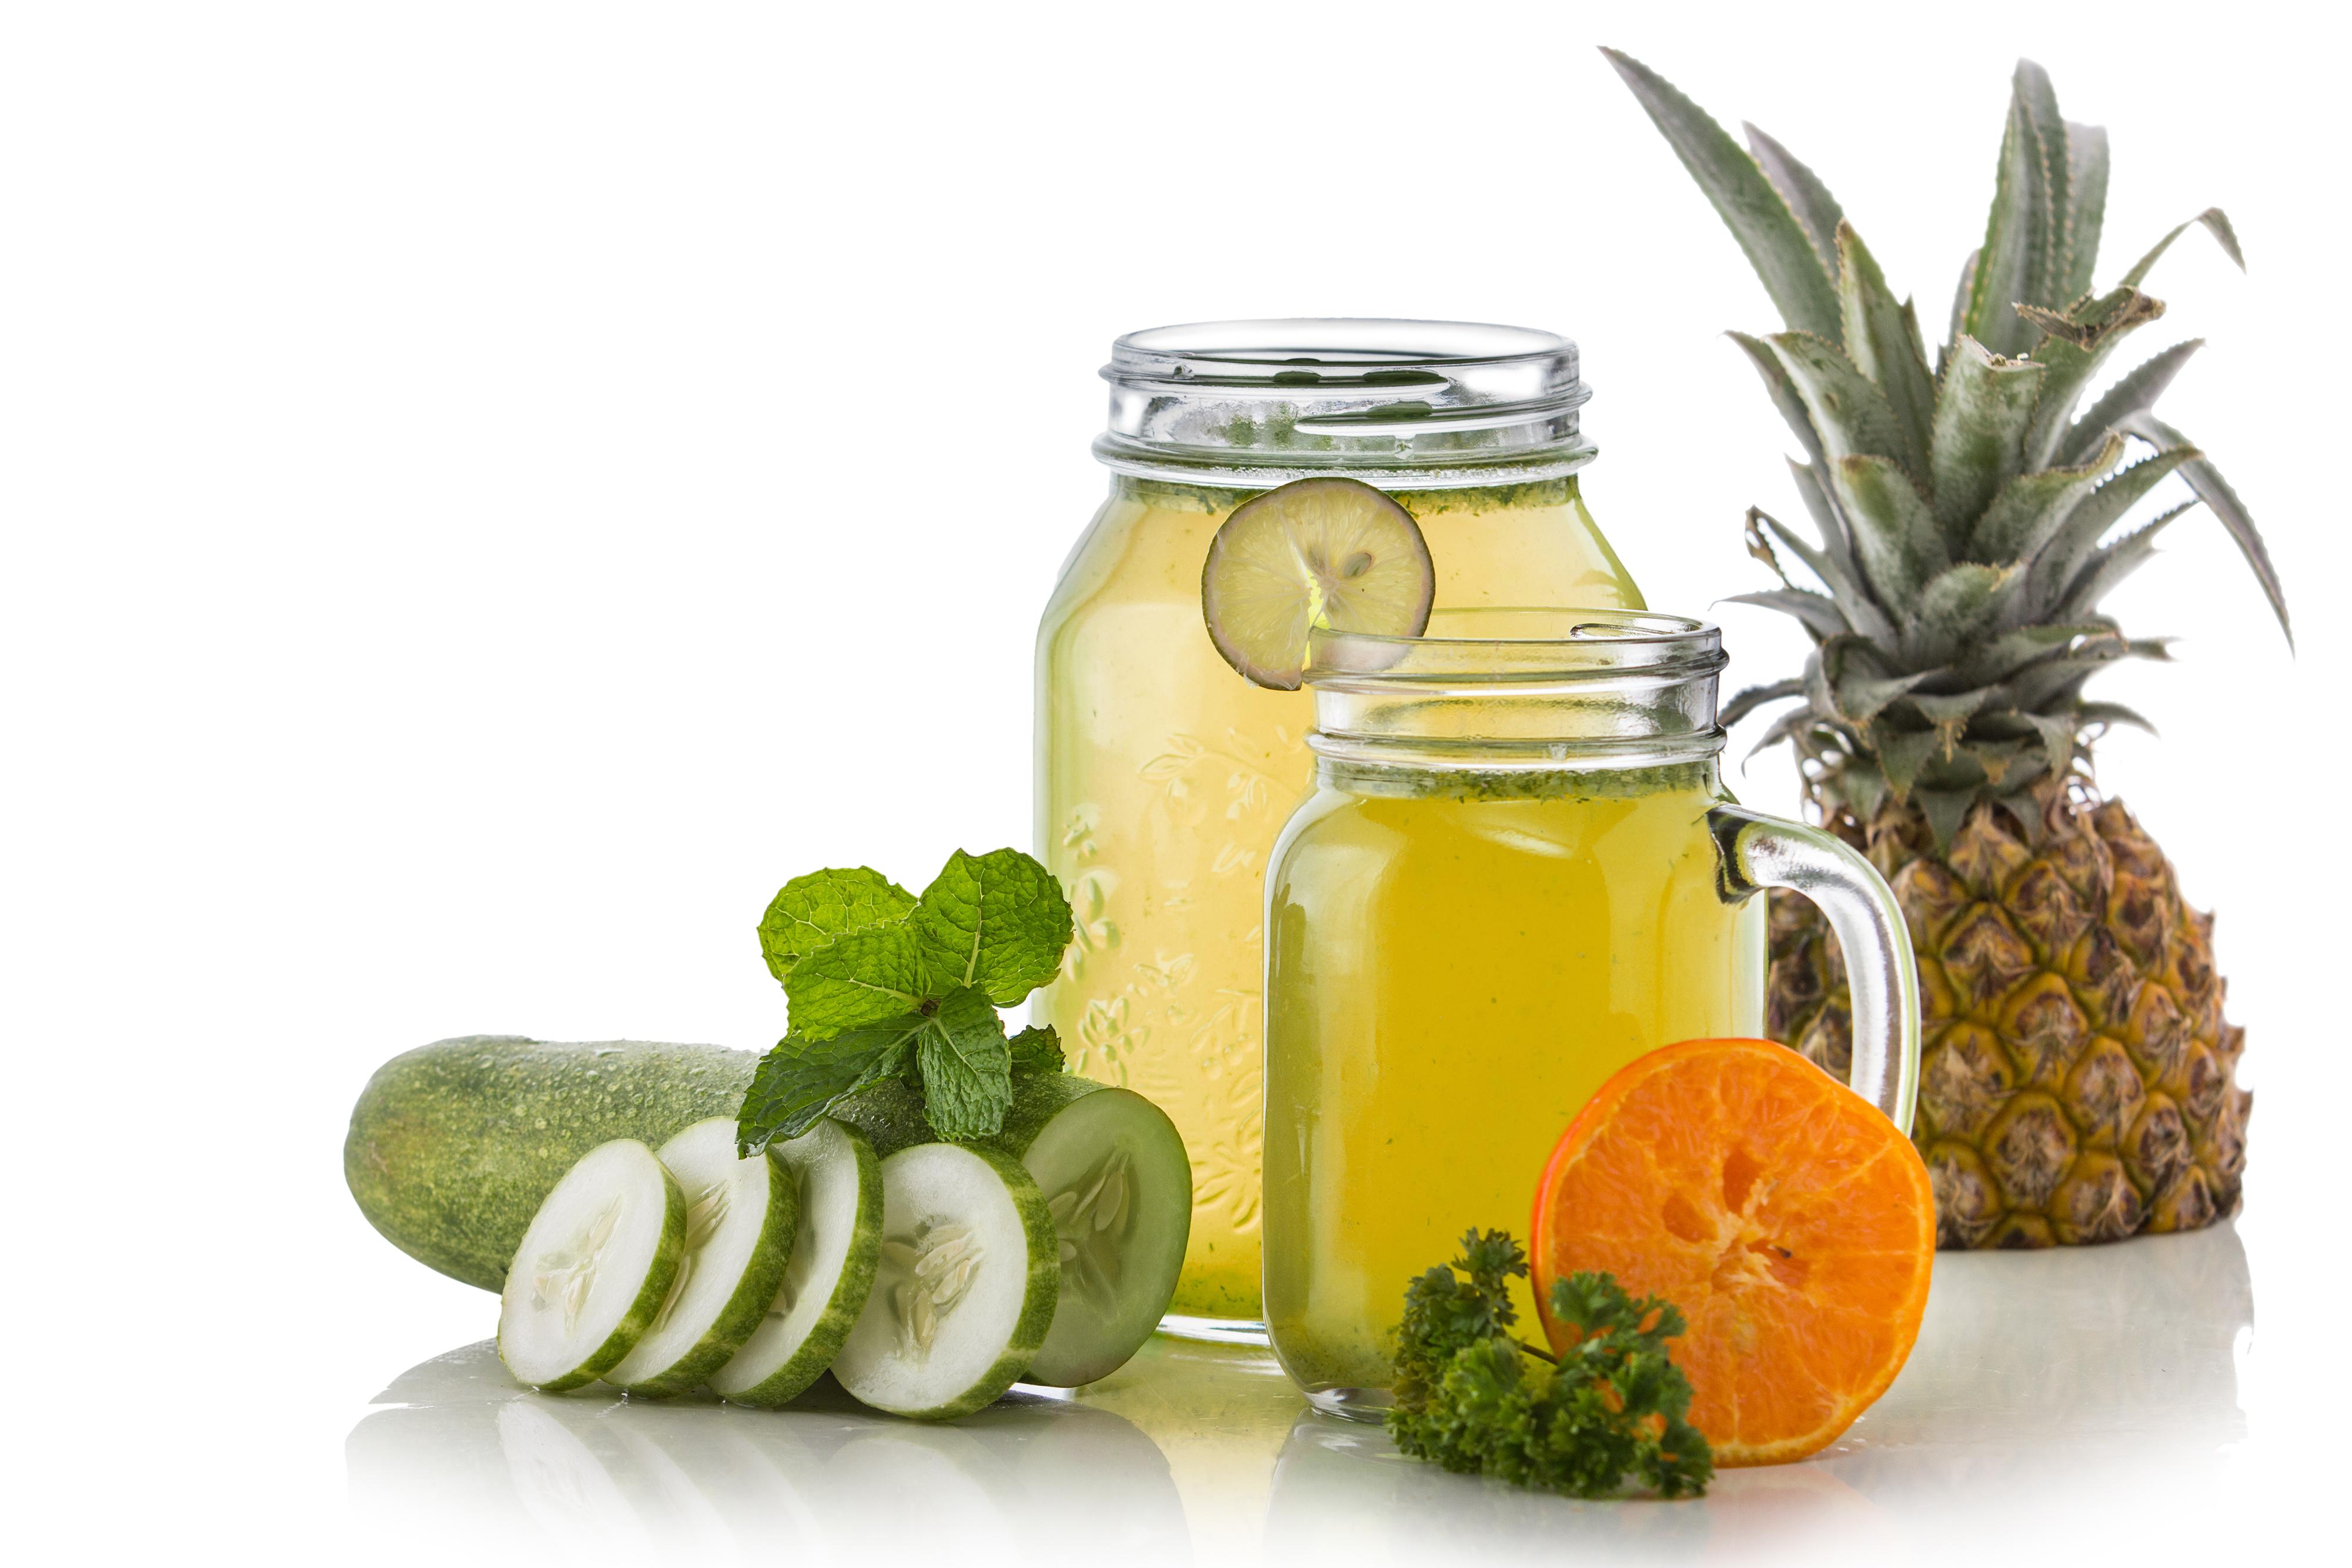 Digestive Health Food and Drinks